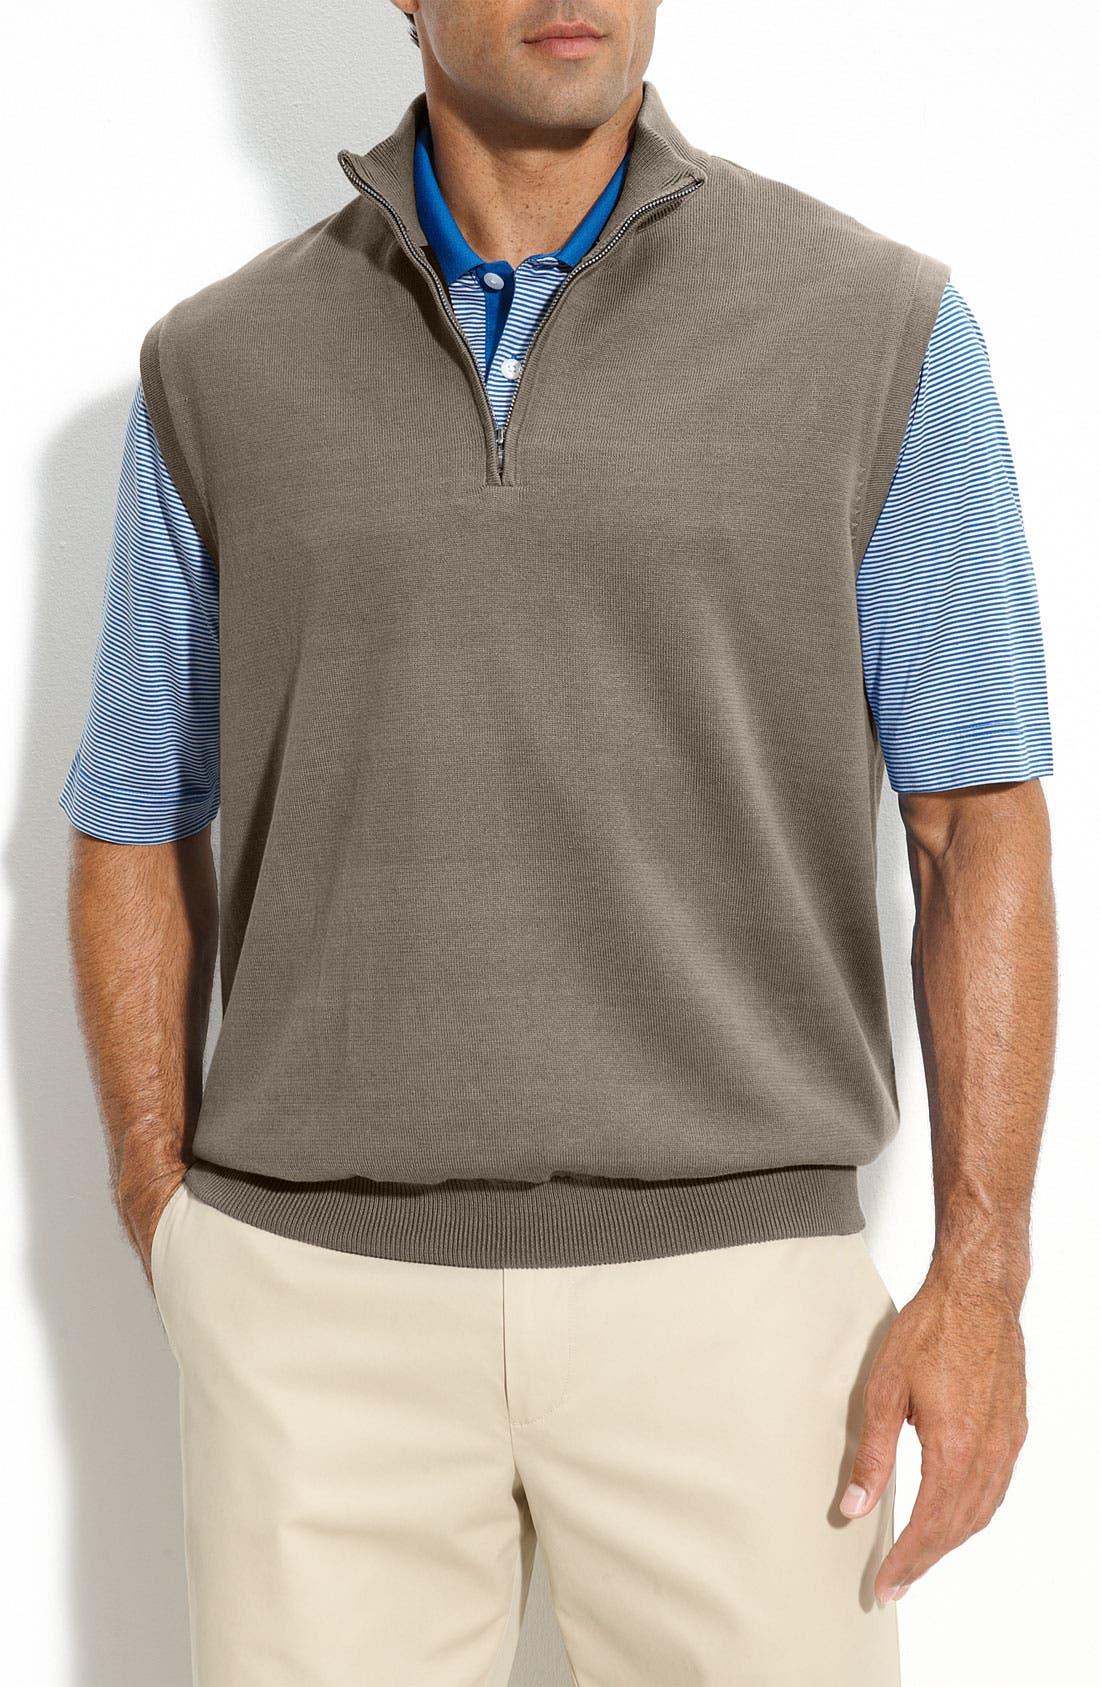 Alternate Image 1 Selected - Cutter & Buck 'Sandpoint' Half Zip Golf Vest